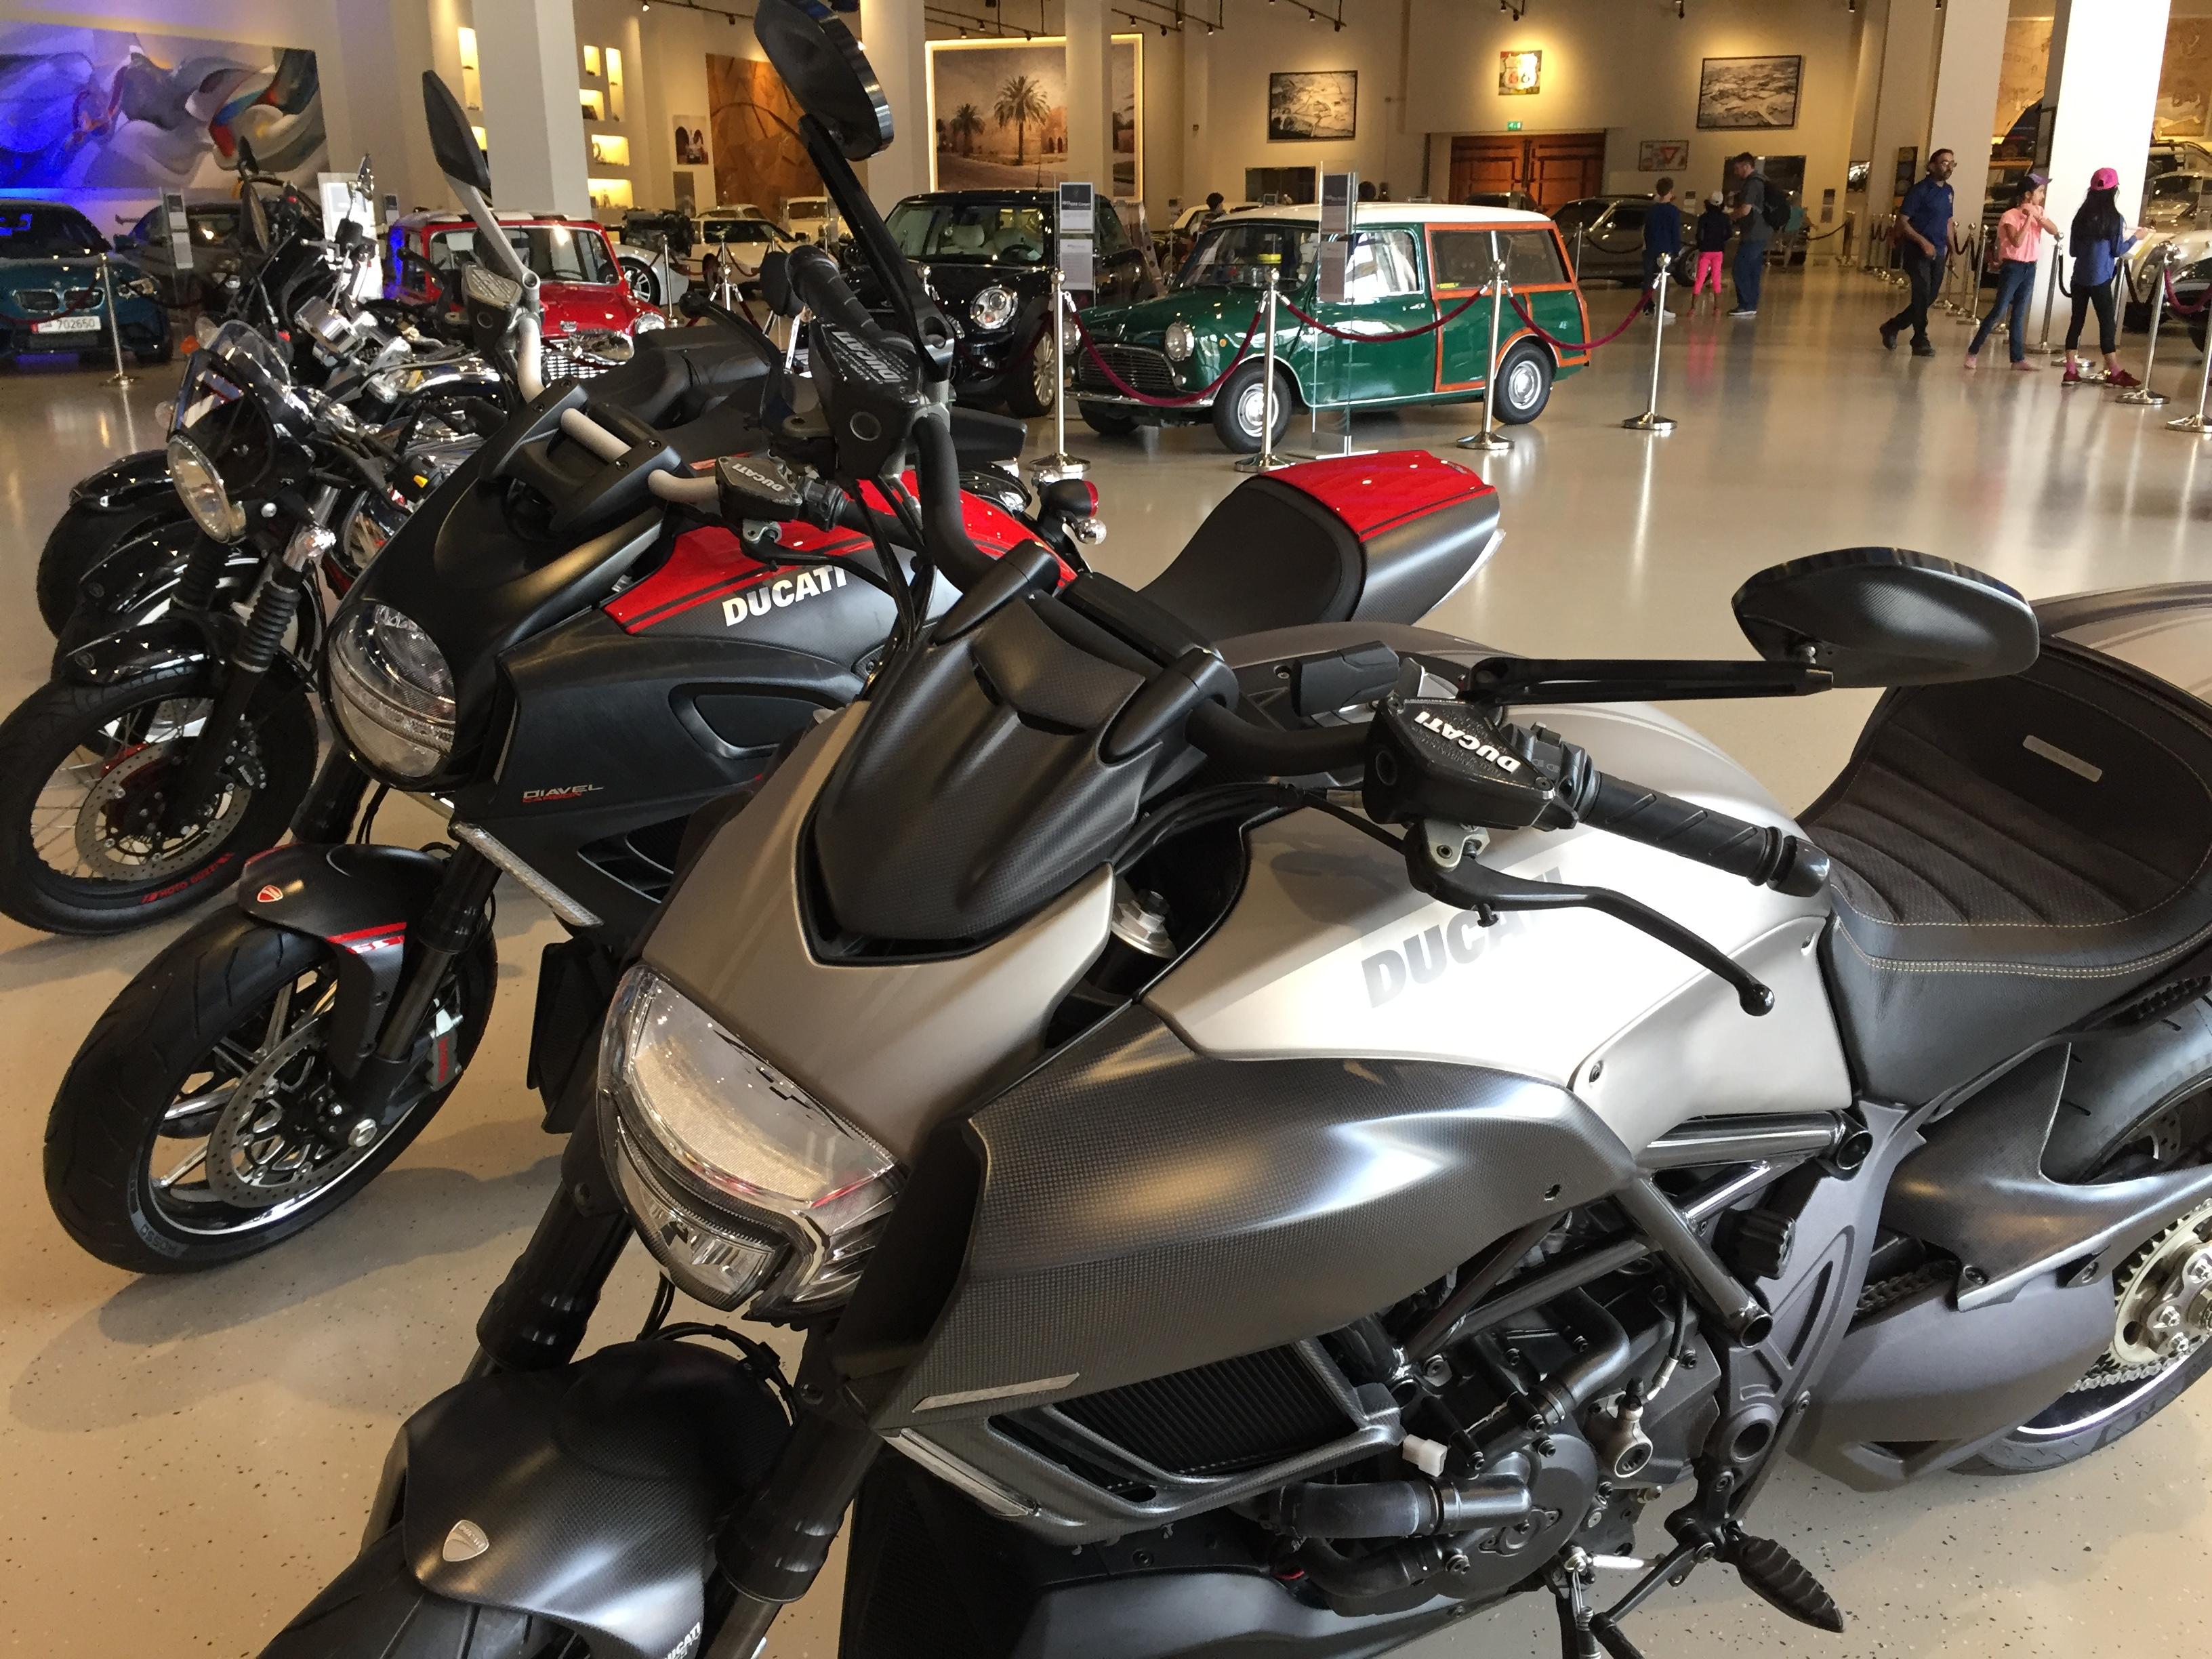 Al Khor, Qatar - Al-Fardan Private Luxury Car Collection - Motorcycle Collection including Ducati and Moto Guzzi